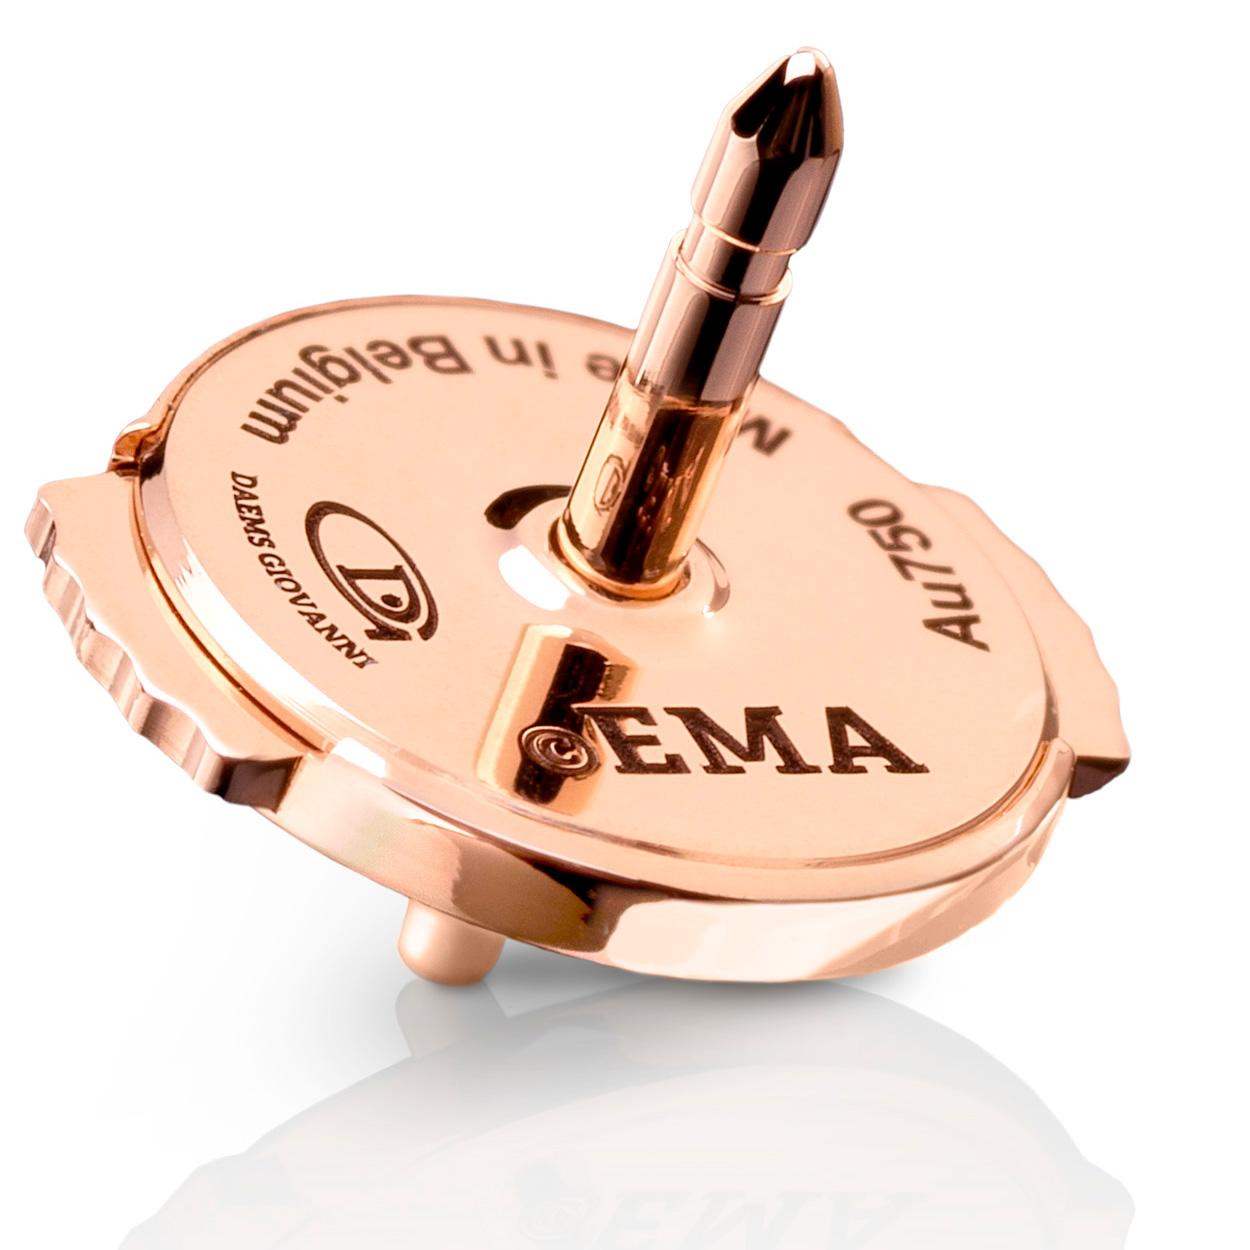 EMA - Rose gold18k Au 5N